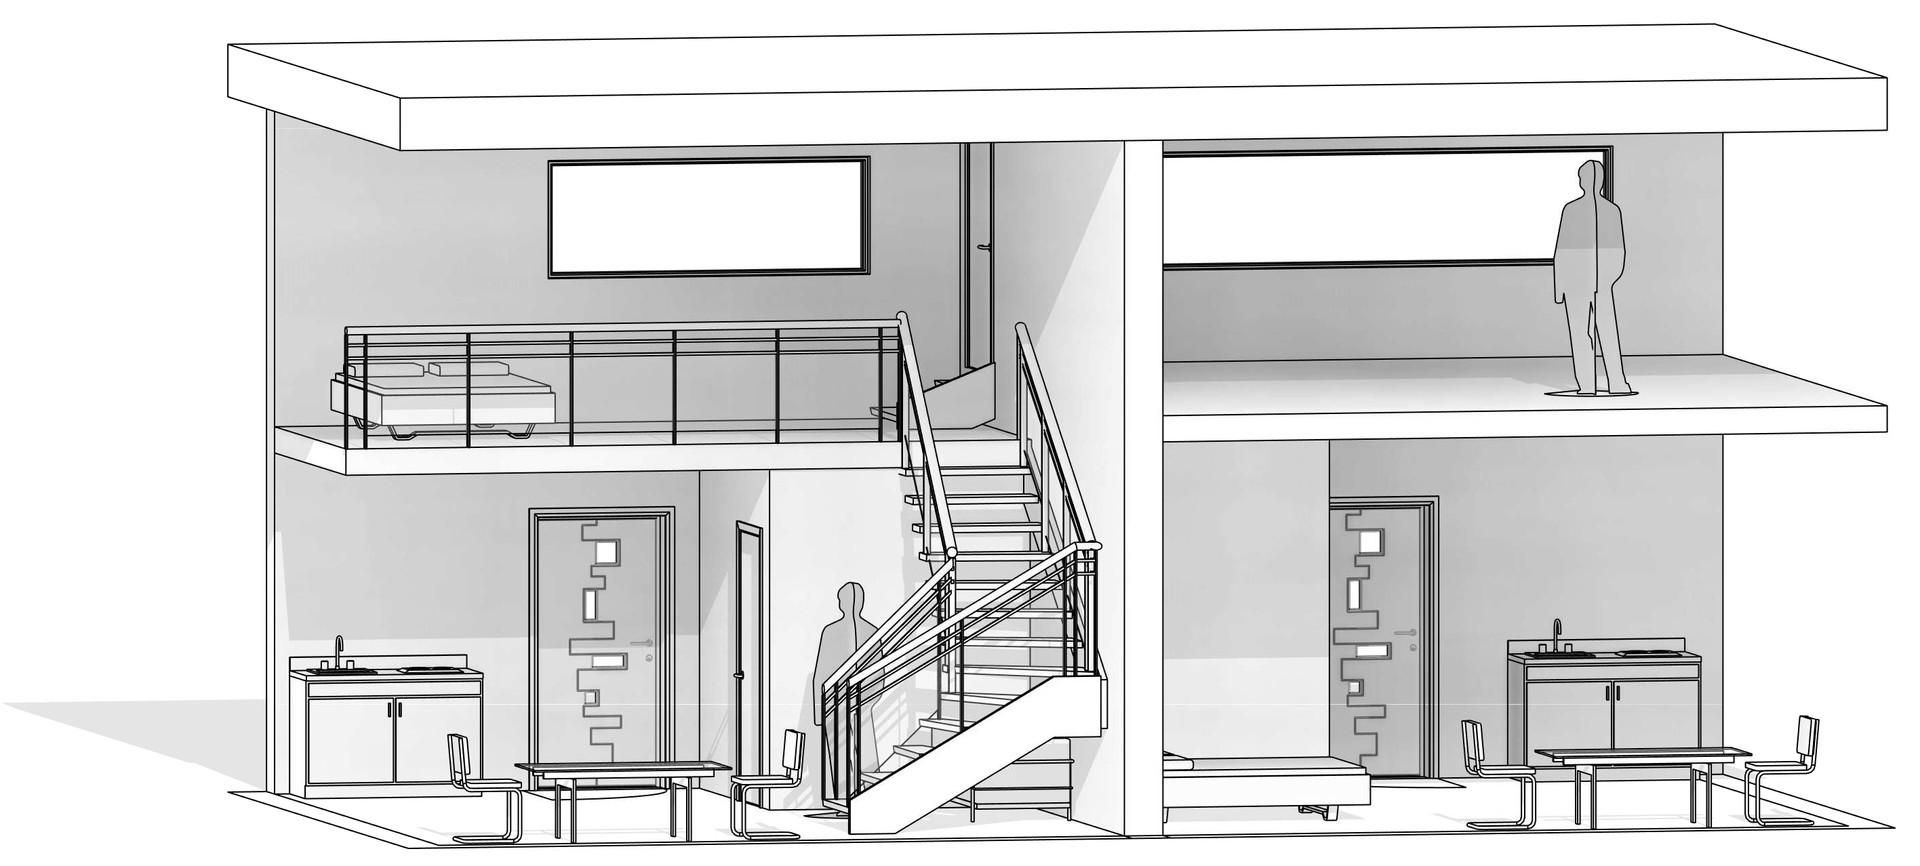 room configuration